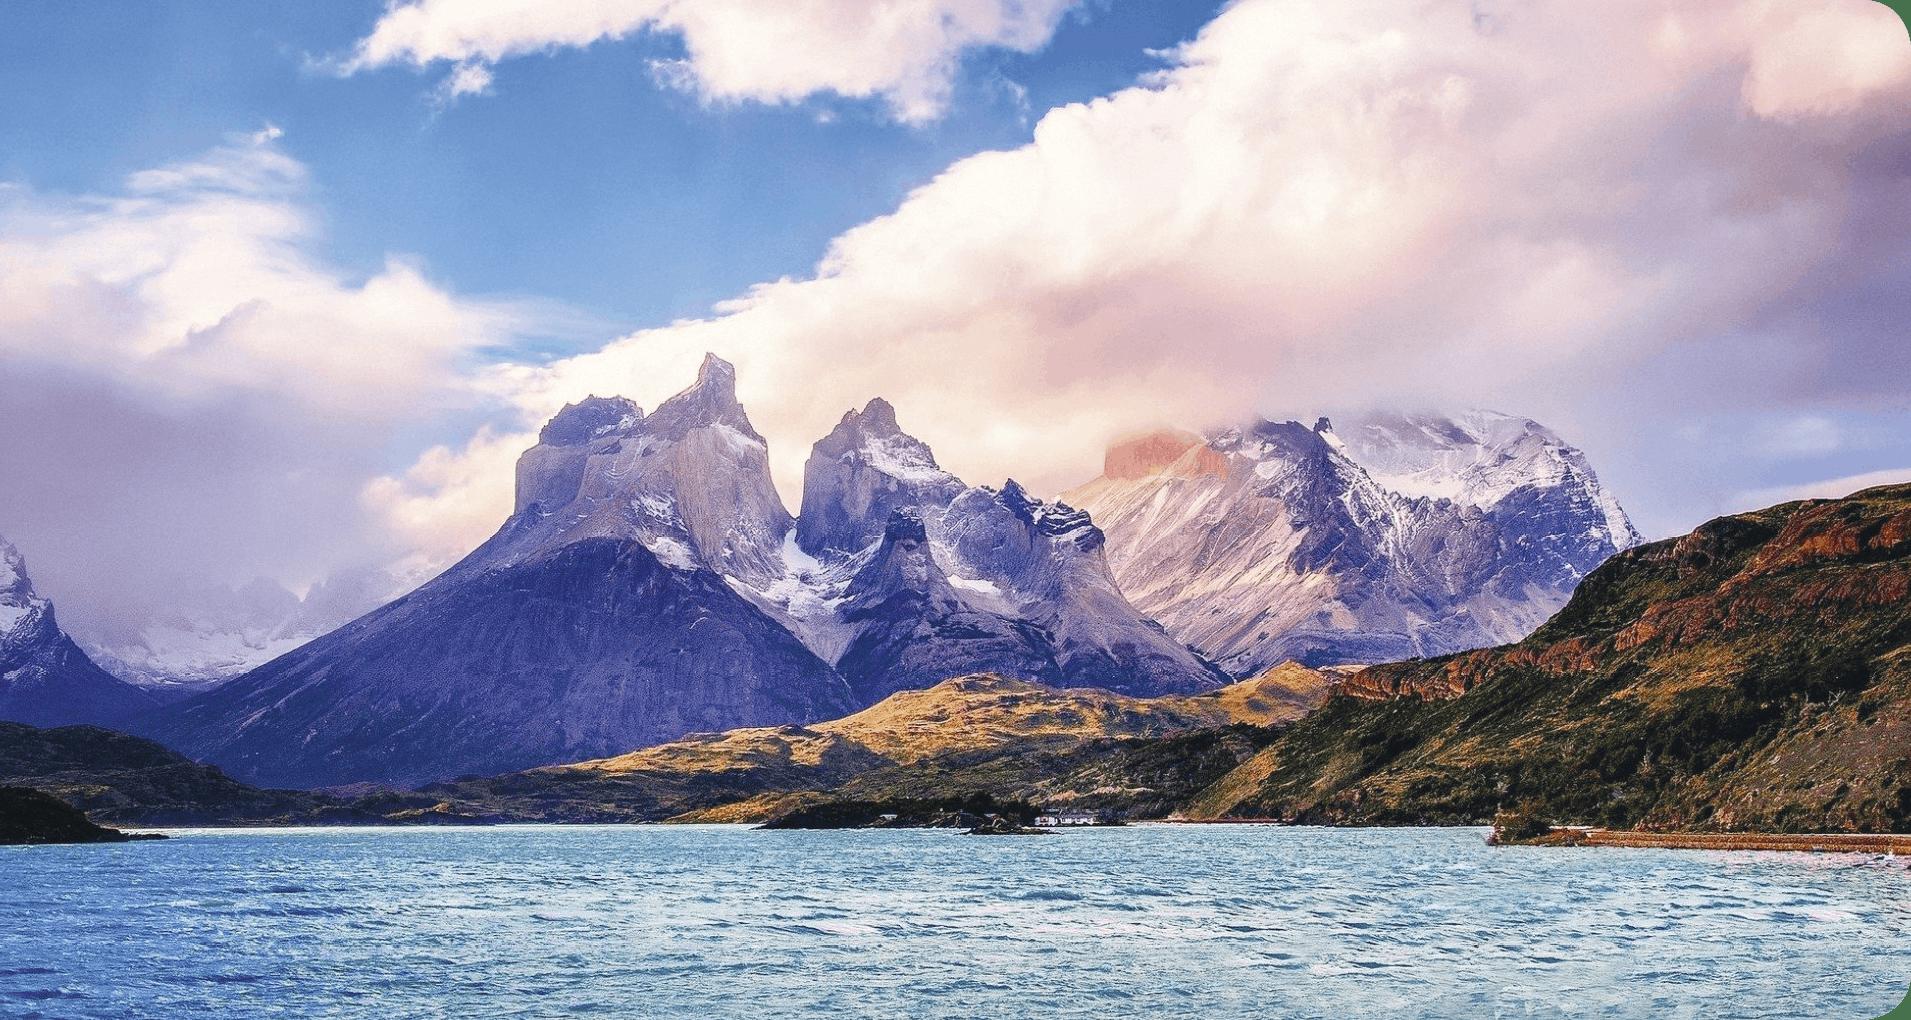 Parque nacional Torres del Paine, visitchile.com, 2019